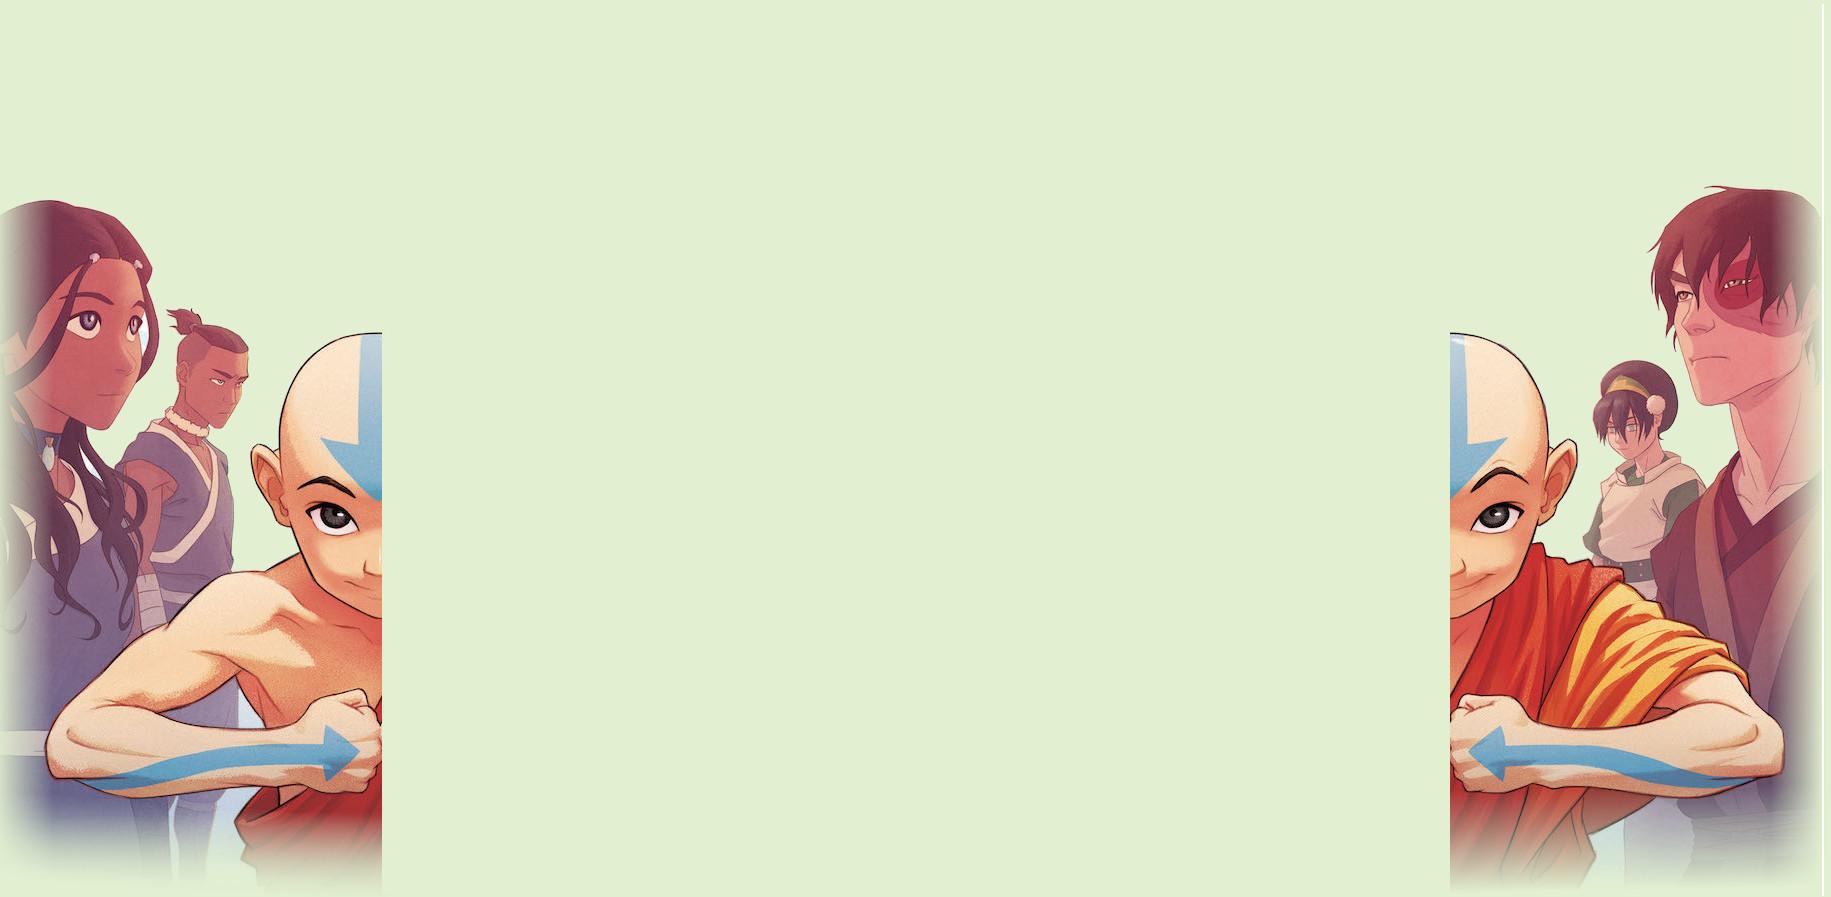 Wildream-fduser/Новый фон на Аватар Вики